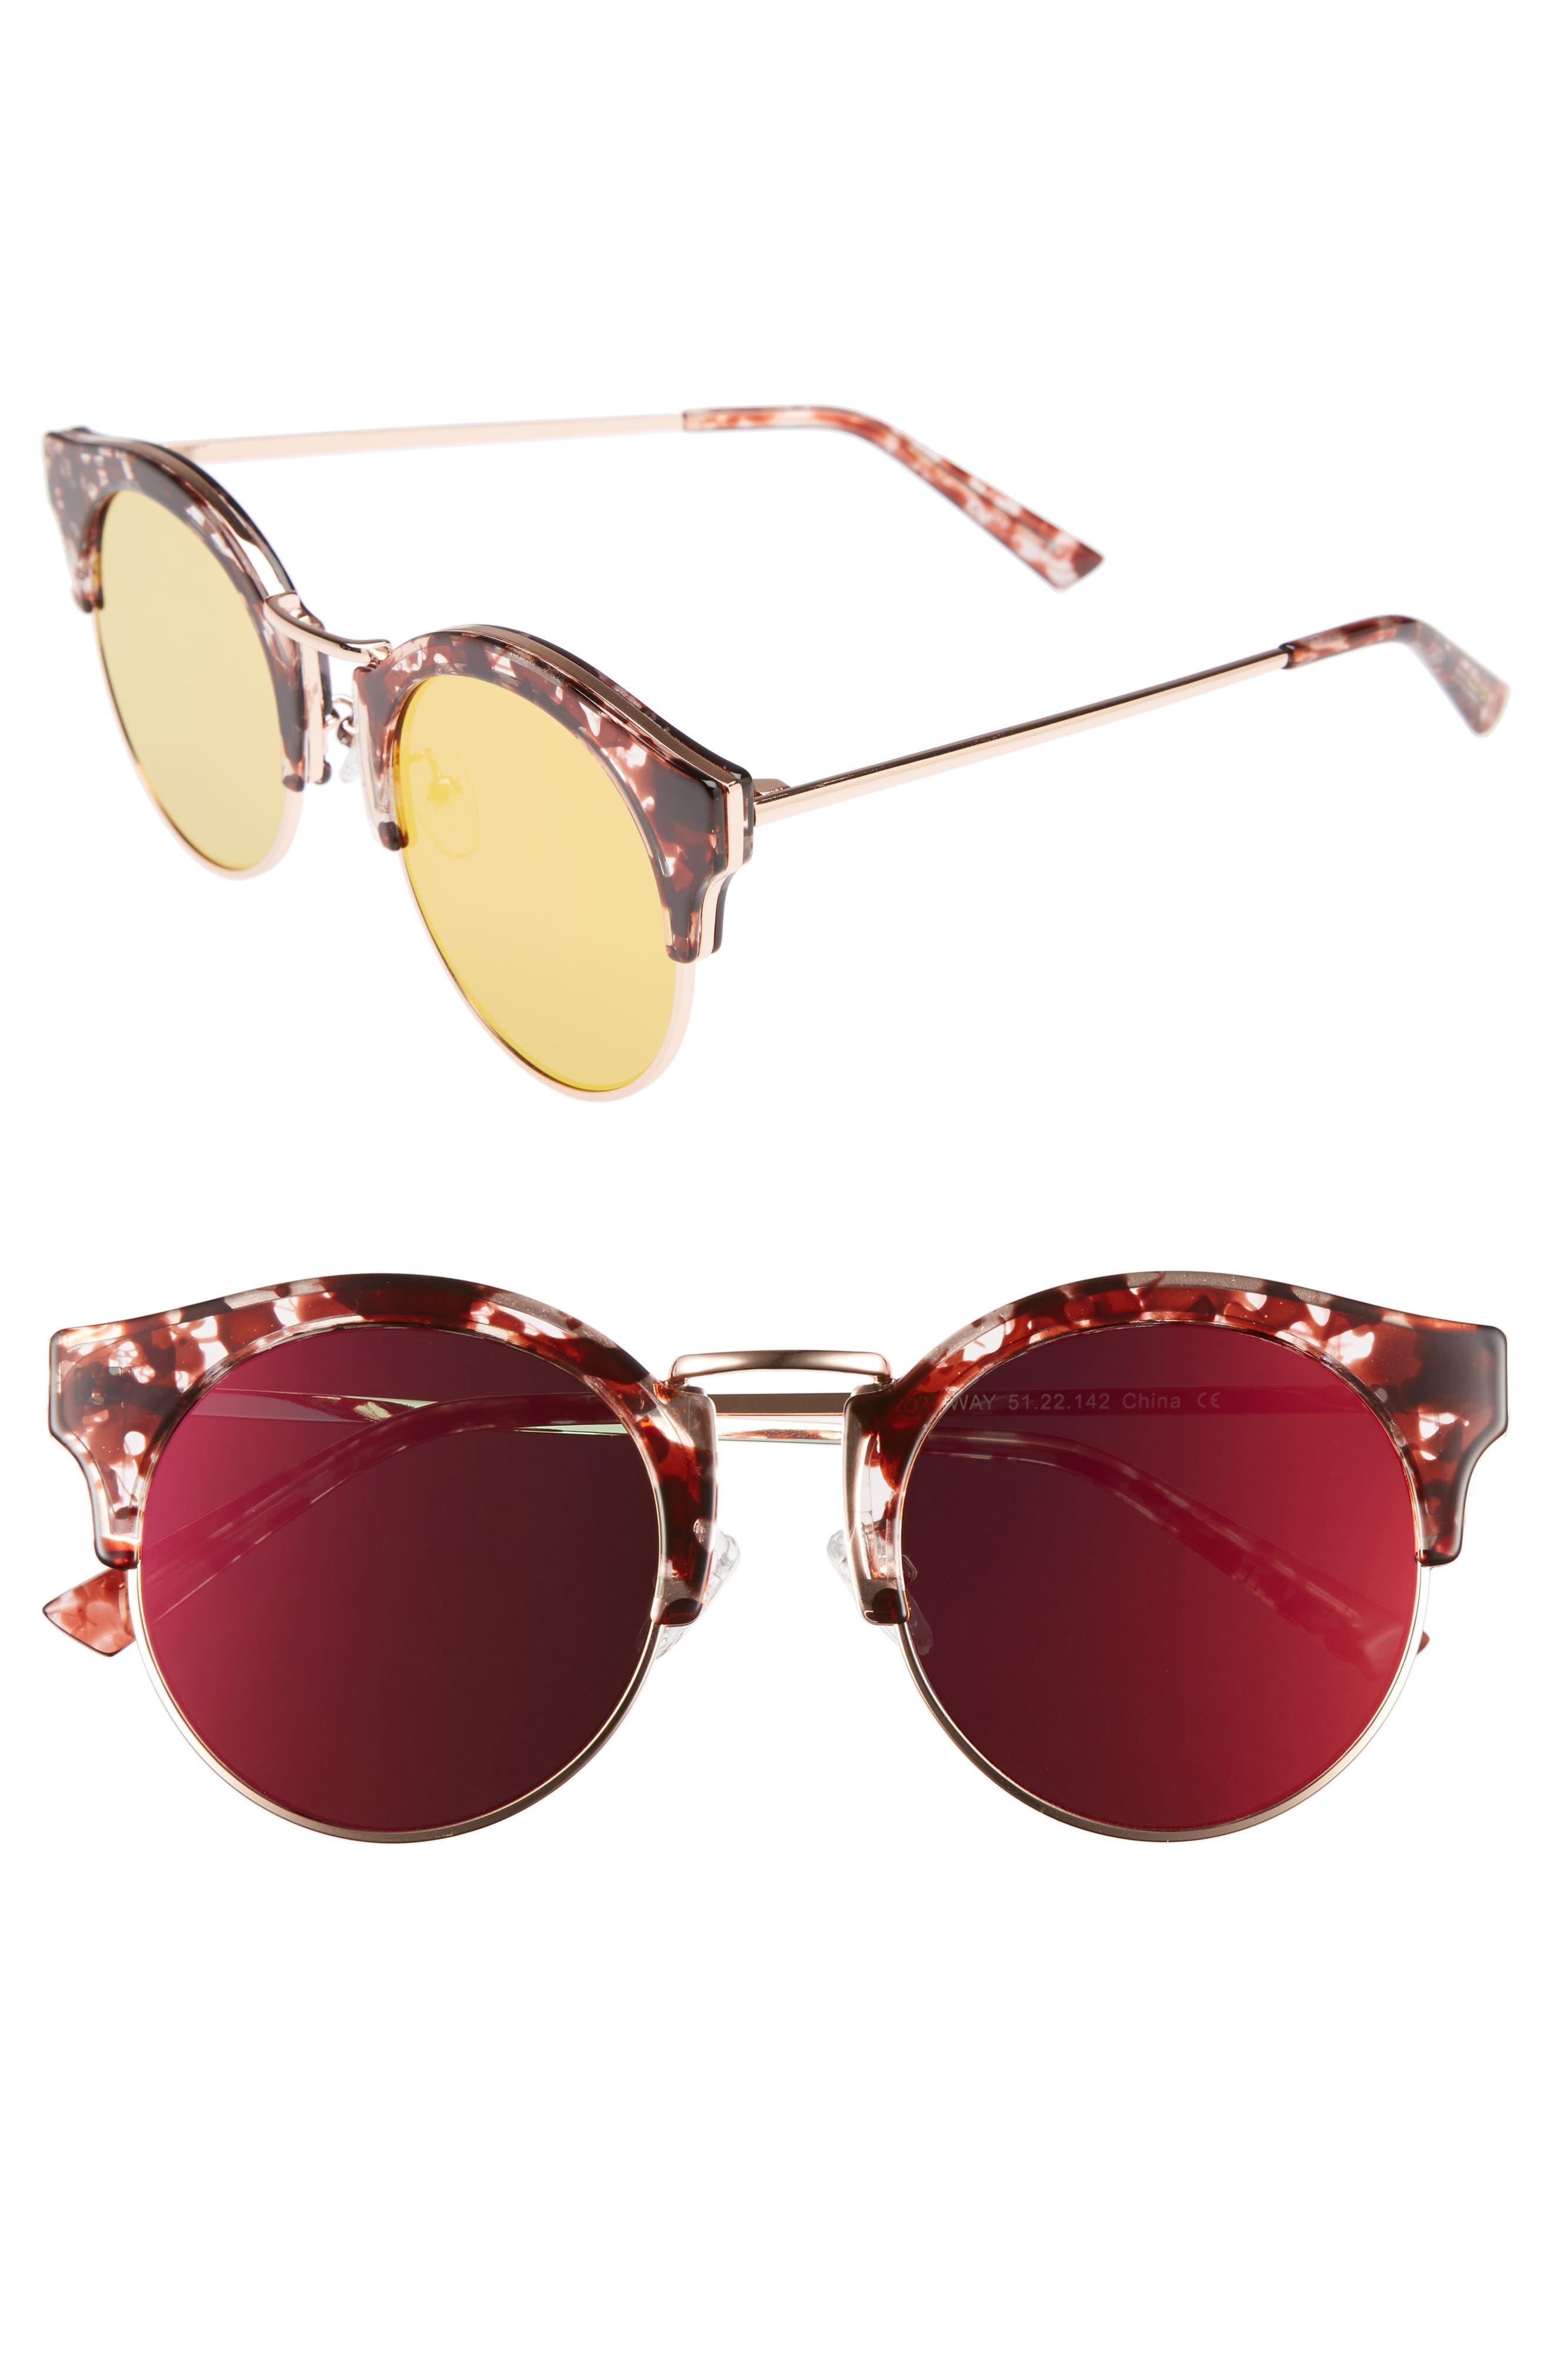 Broadway 51mm Retro Sunglasses,                         Main,                         color, Lovesick Red